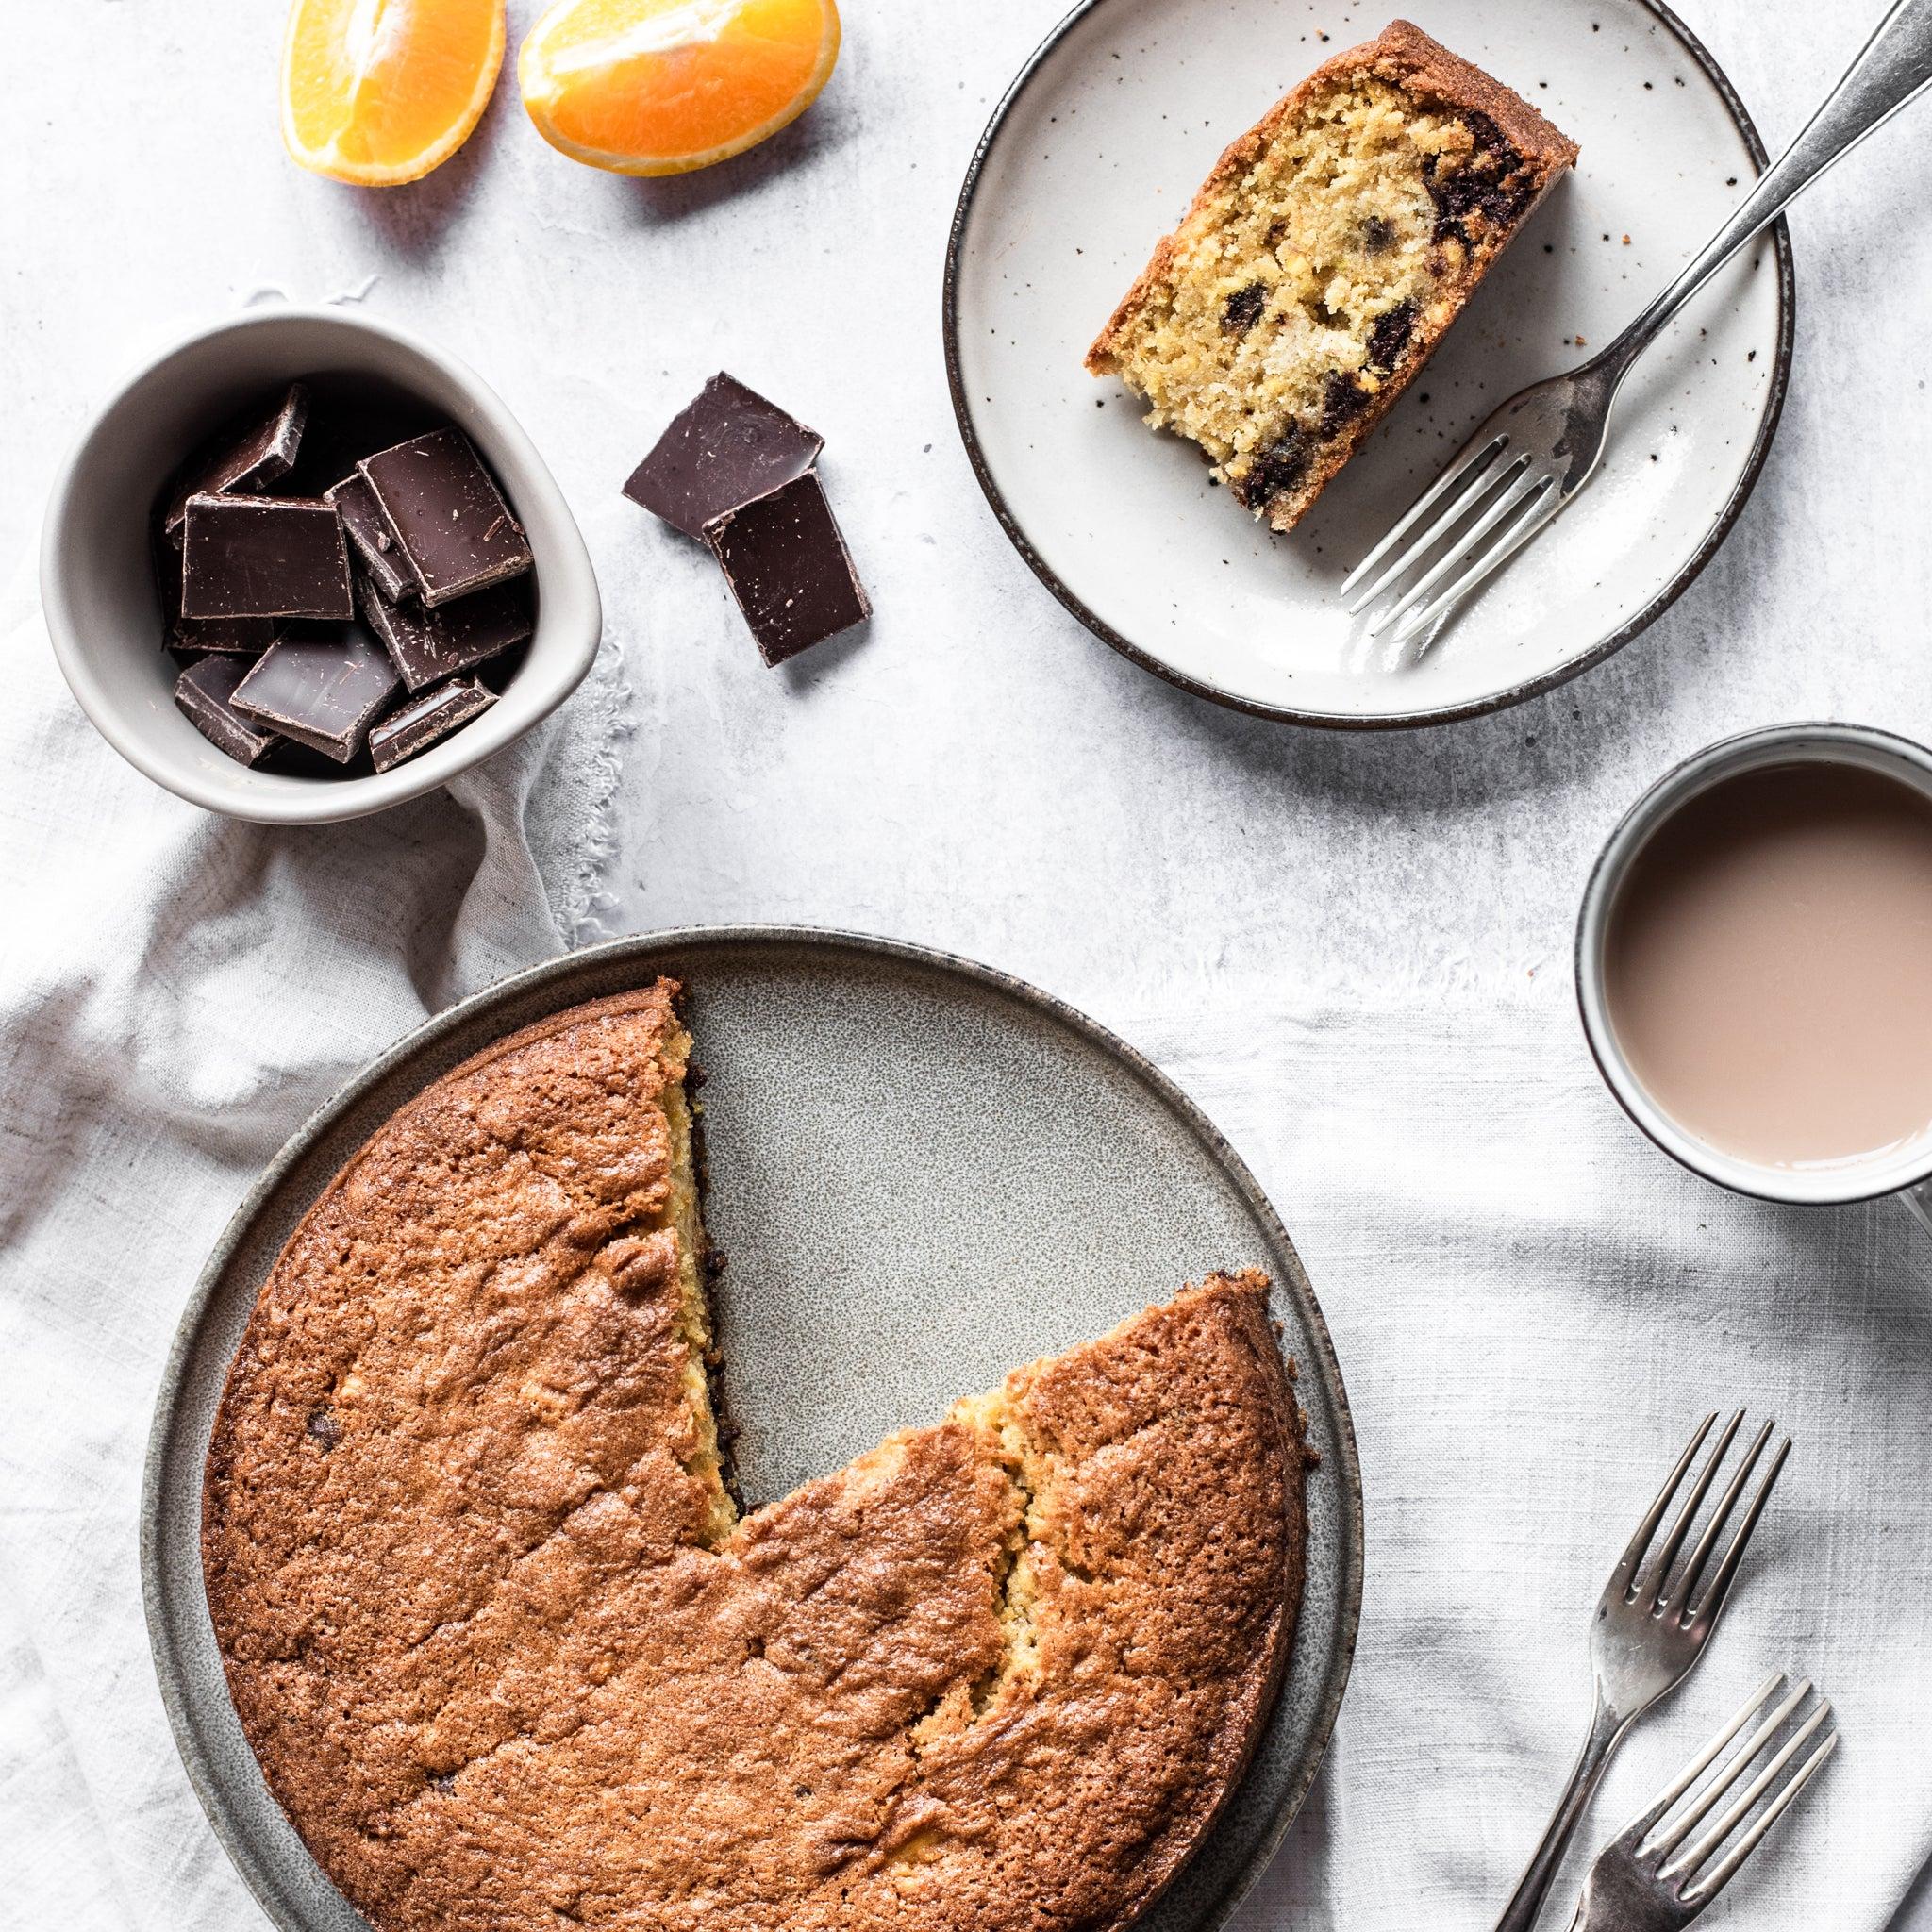 Chocolate-Orange-Cake-SQUARE-2_1.jpg